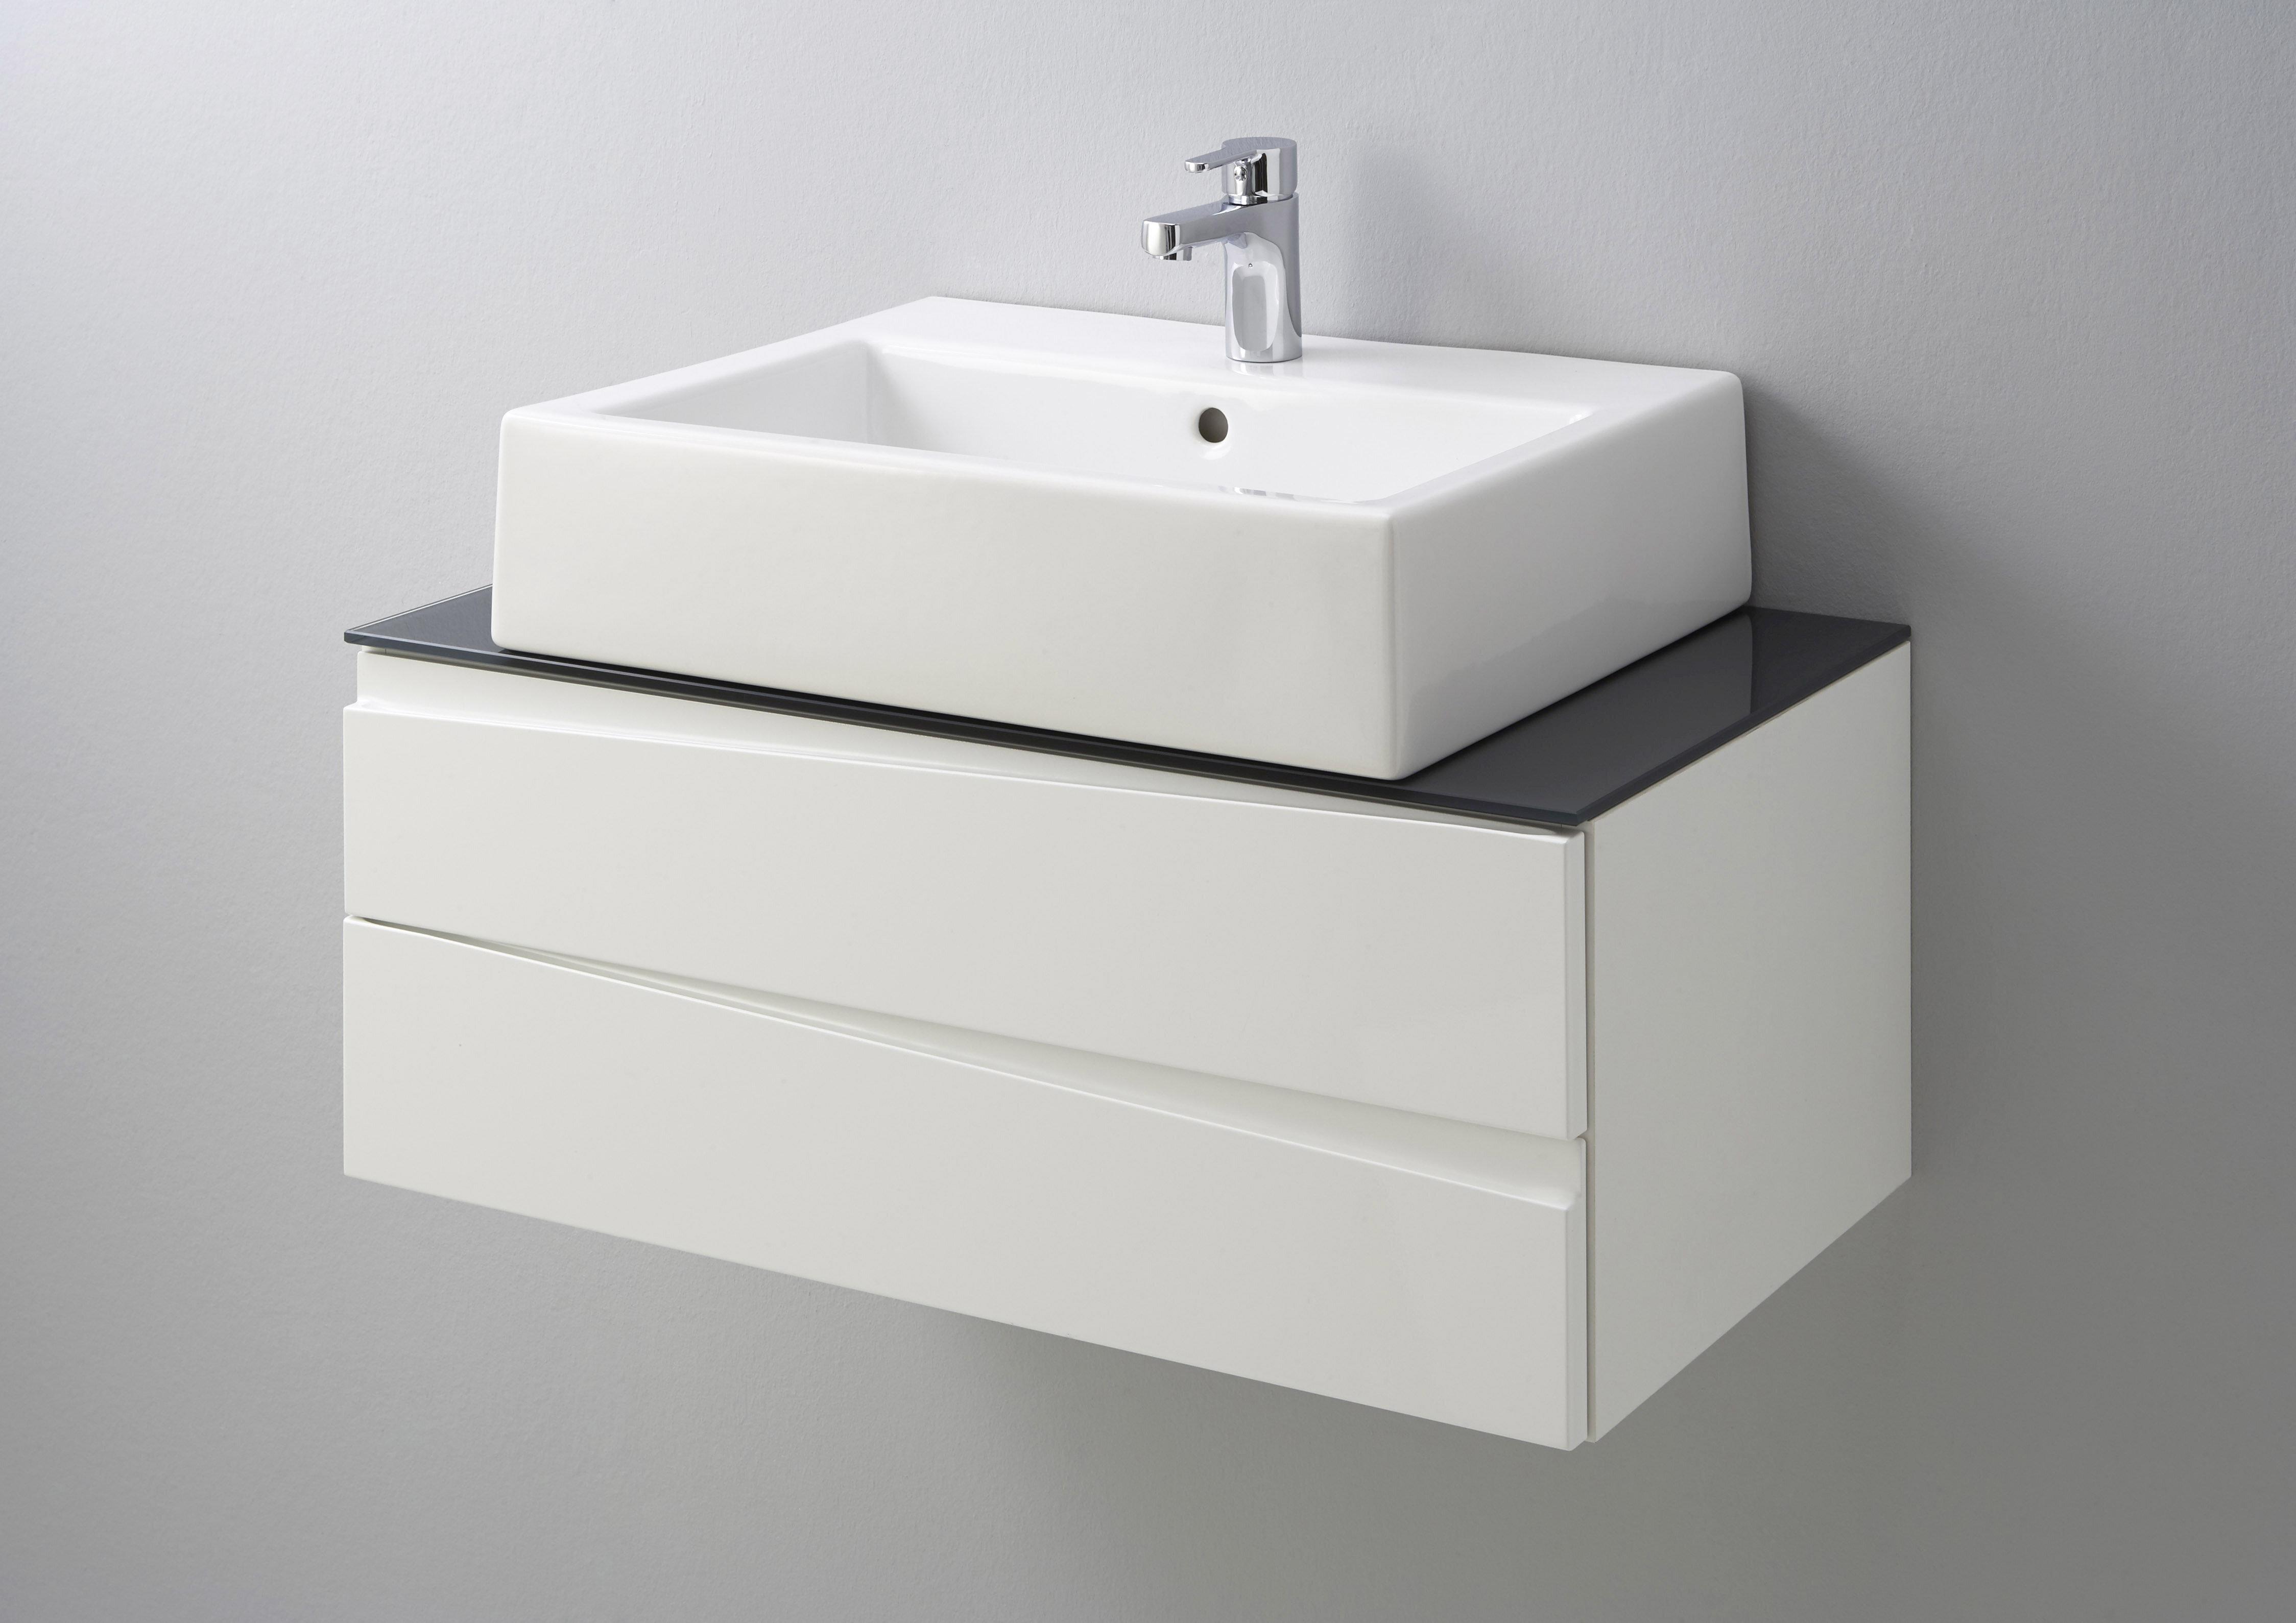 Belfry Bathroom Walnut Ceramic